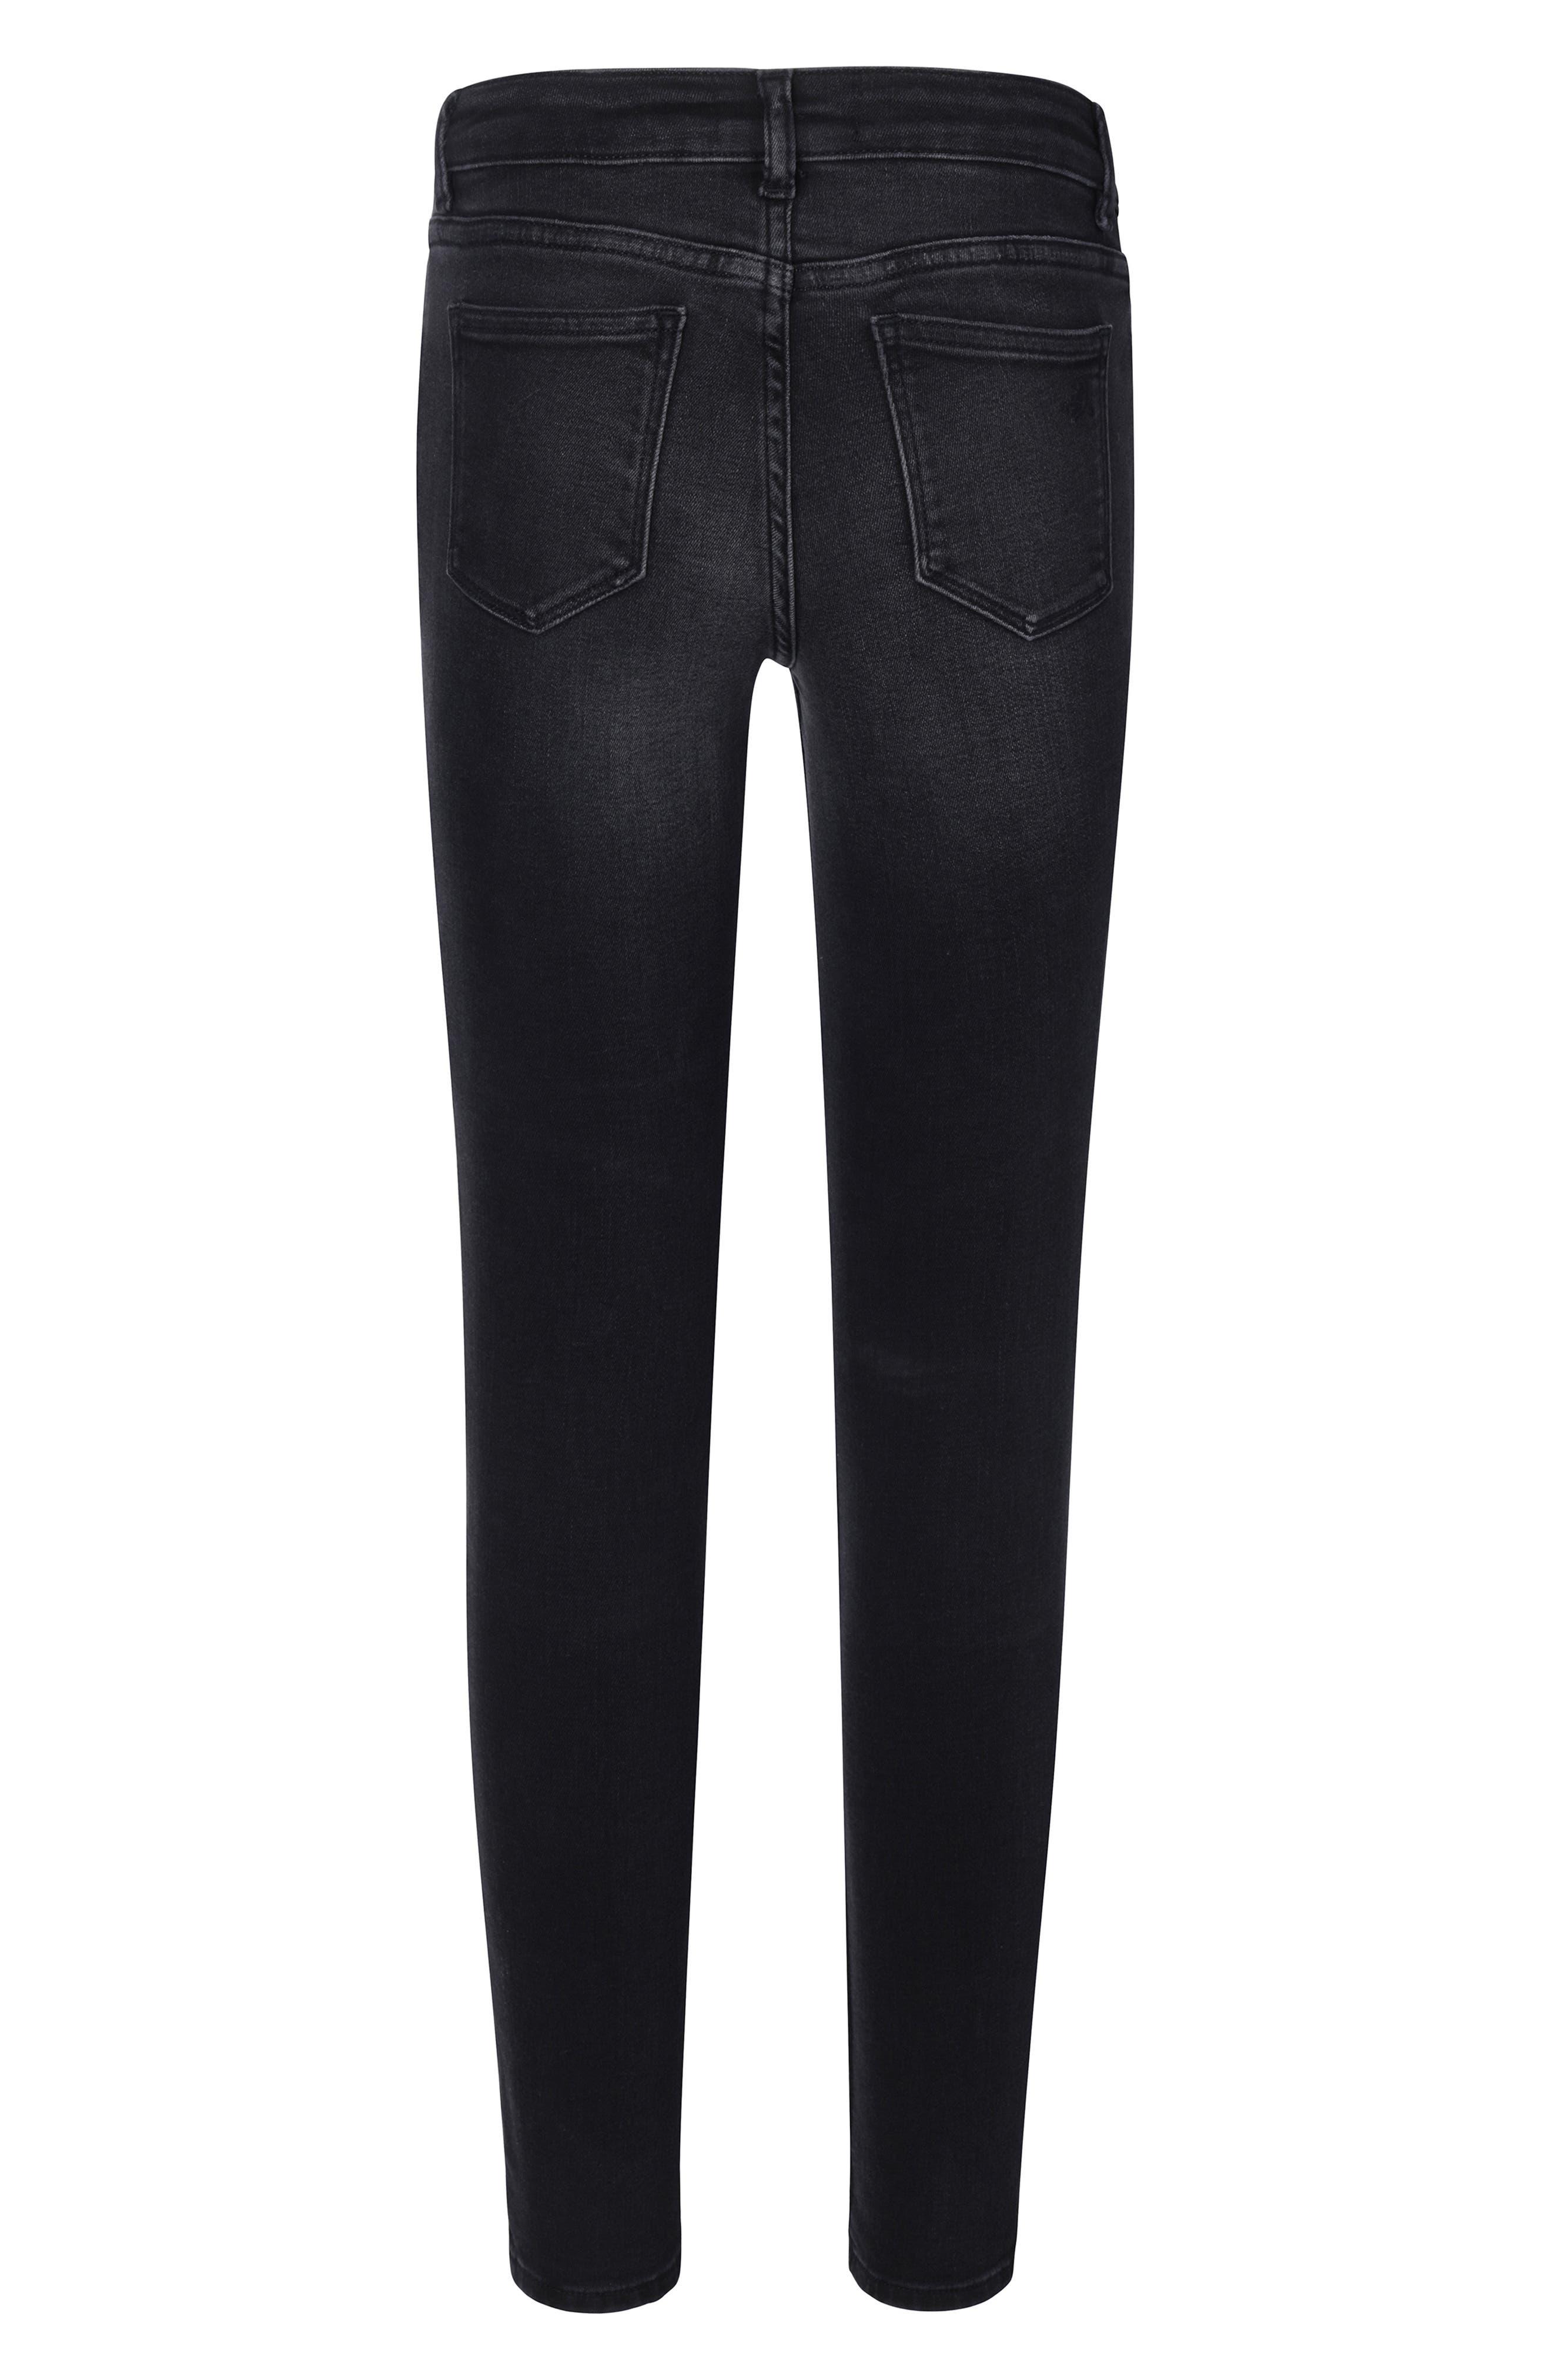 Chloe Moto Skinny Jeans,                             Alternate thumbnail 2, color,                             DUTCH